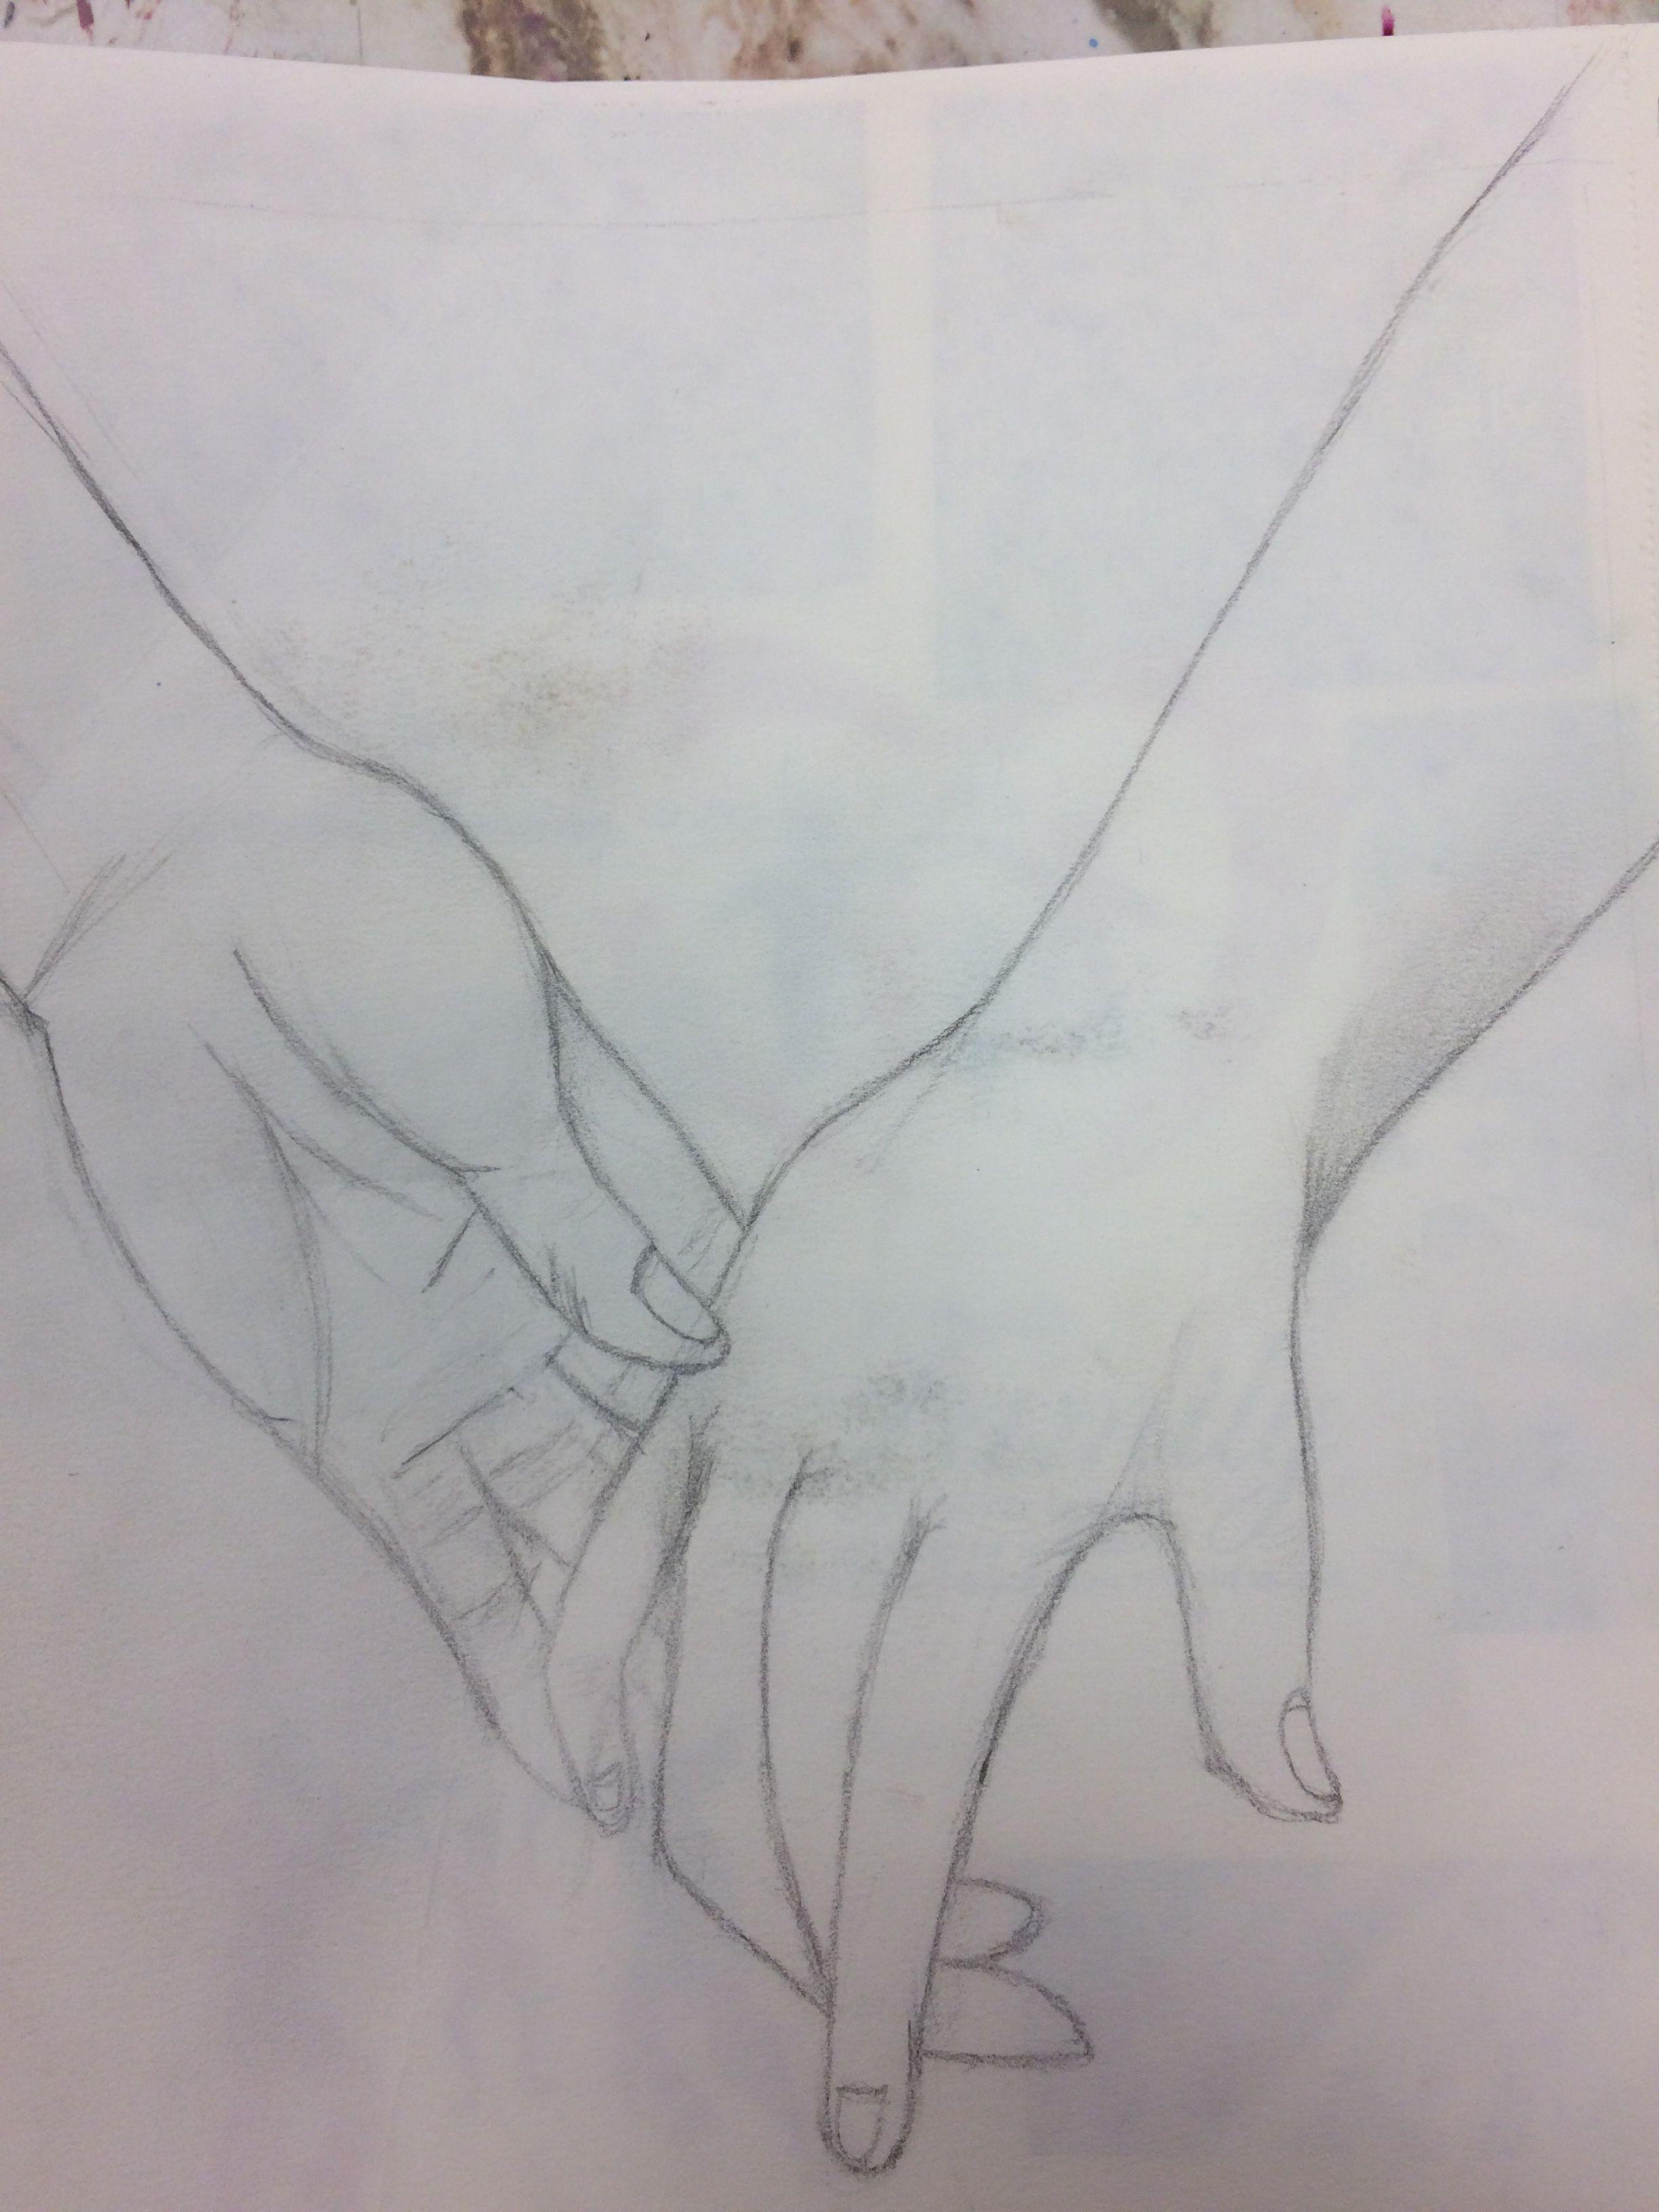 Realistic holding hands sketch graphite | My art | Pinterest